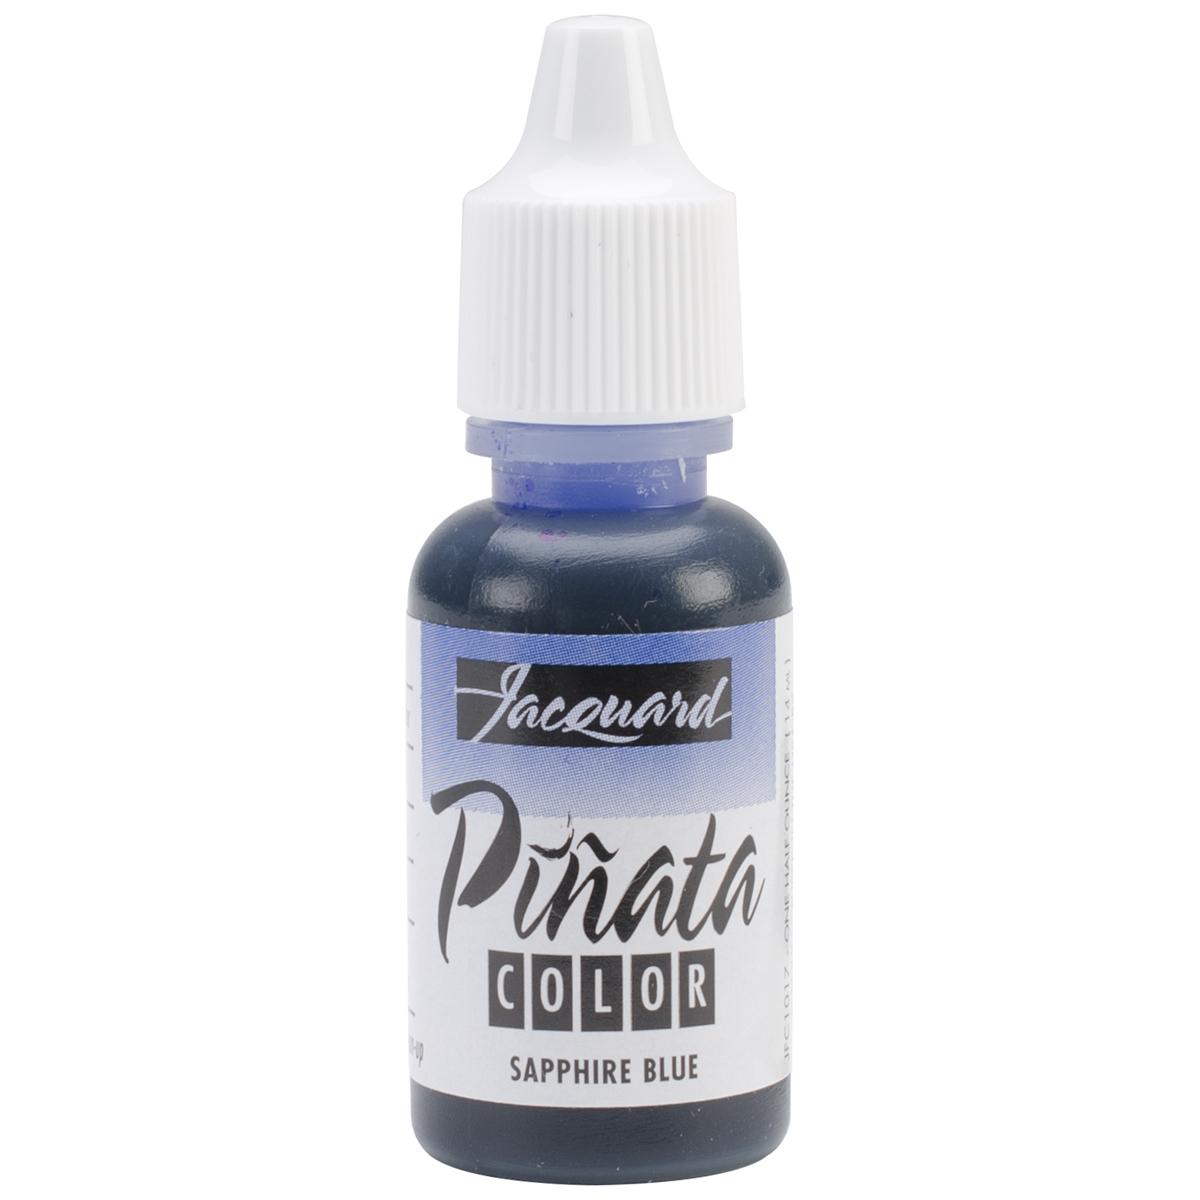 Jacquard Pinata Color Alcohol Ink .5oz-Sapphire Blue